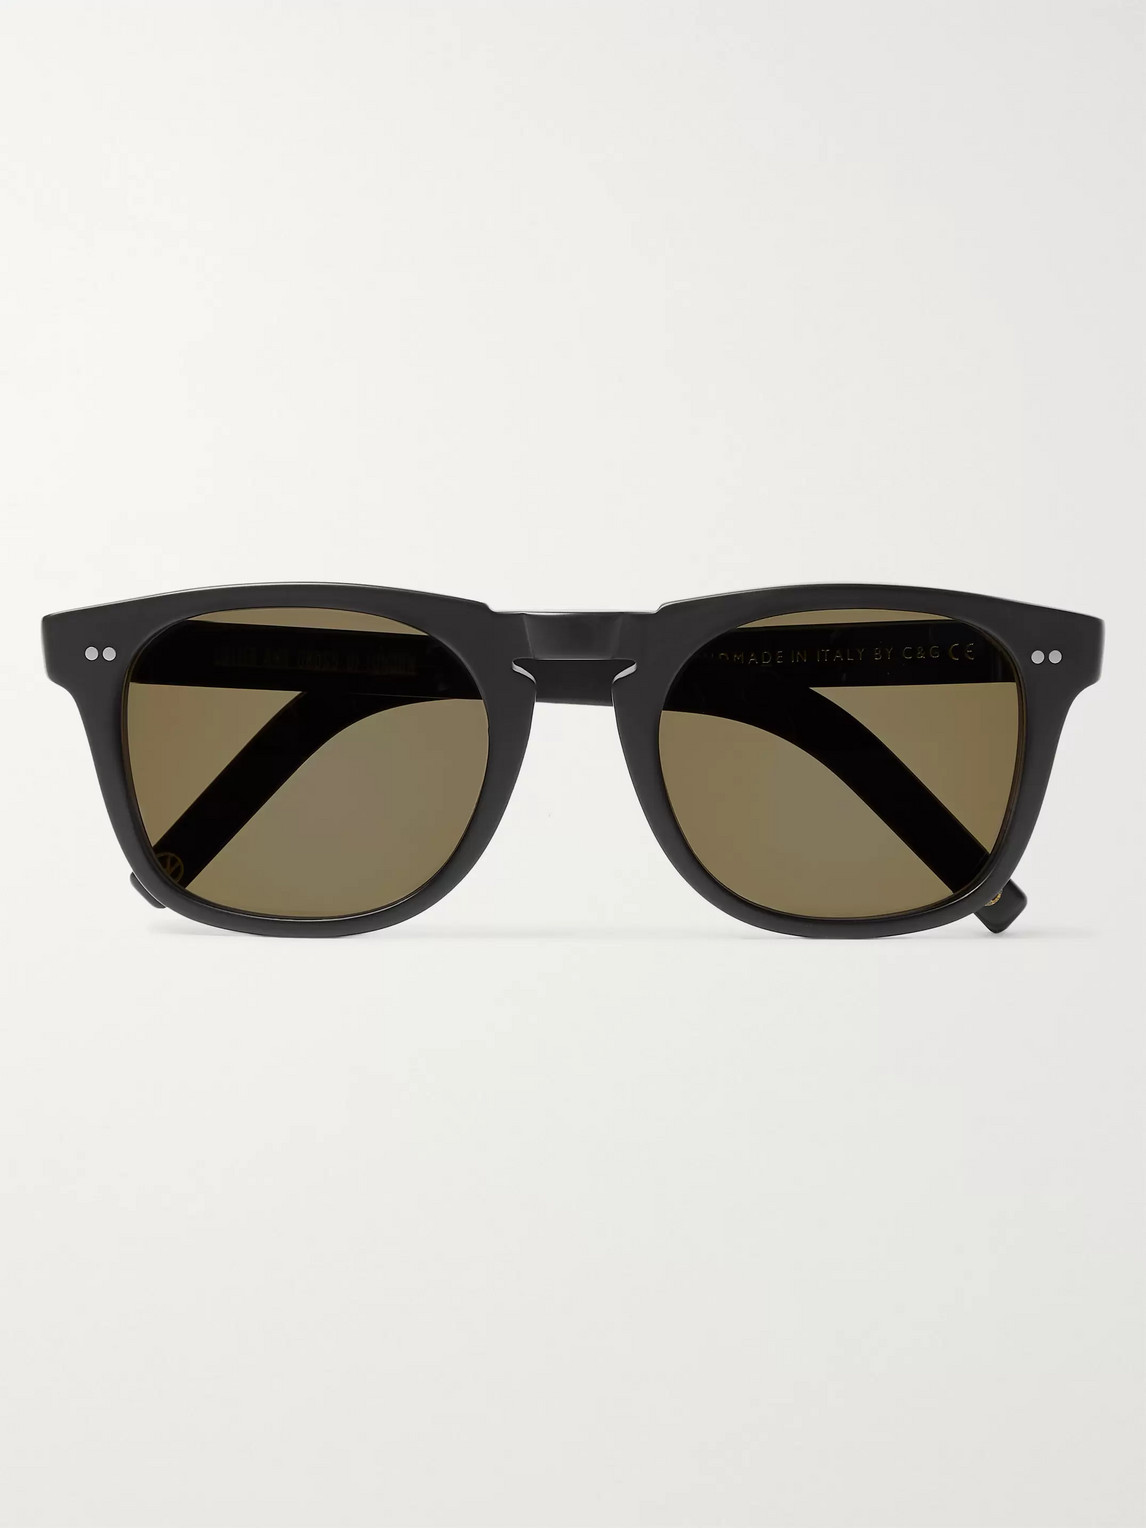 Kingsman Cutler And Gross Square-frame Matte-acetate Sunglasses In Black